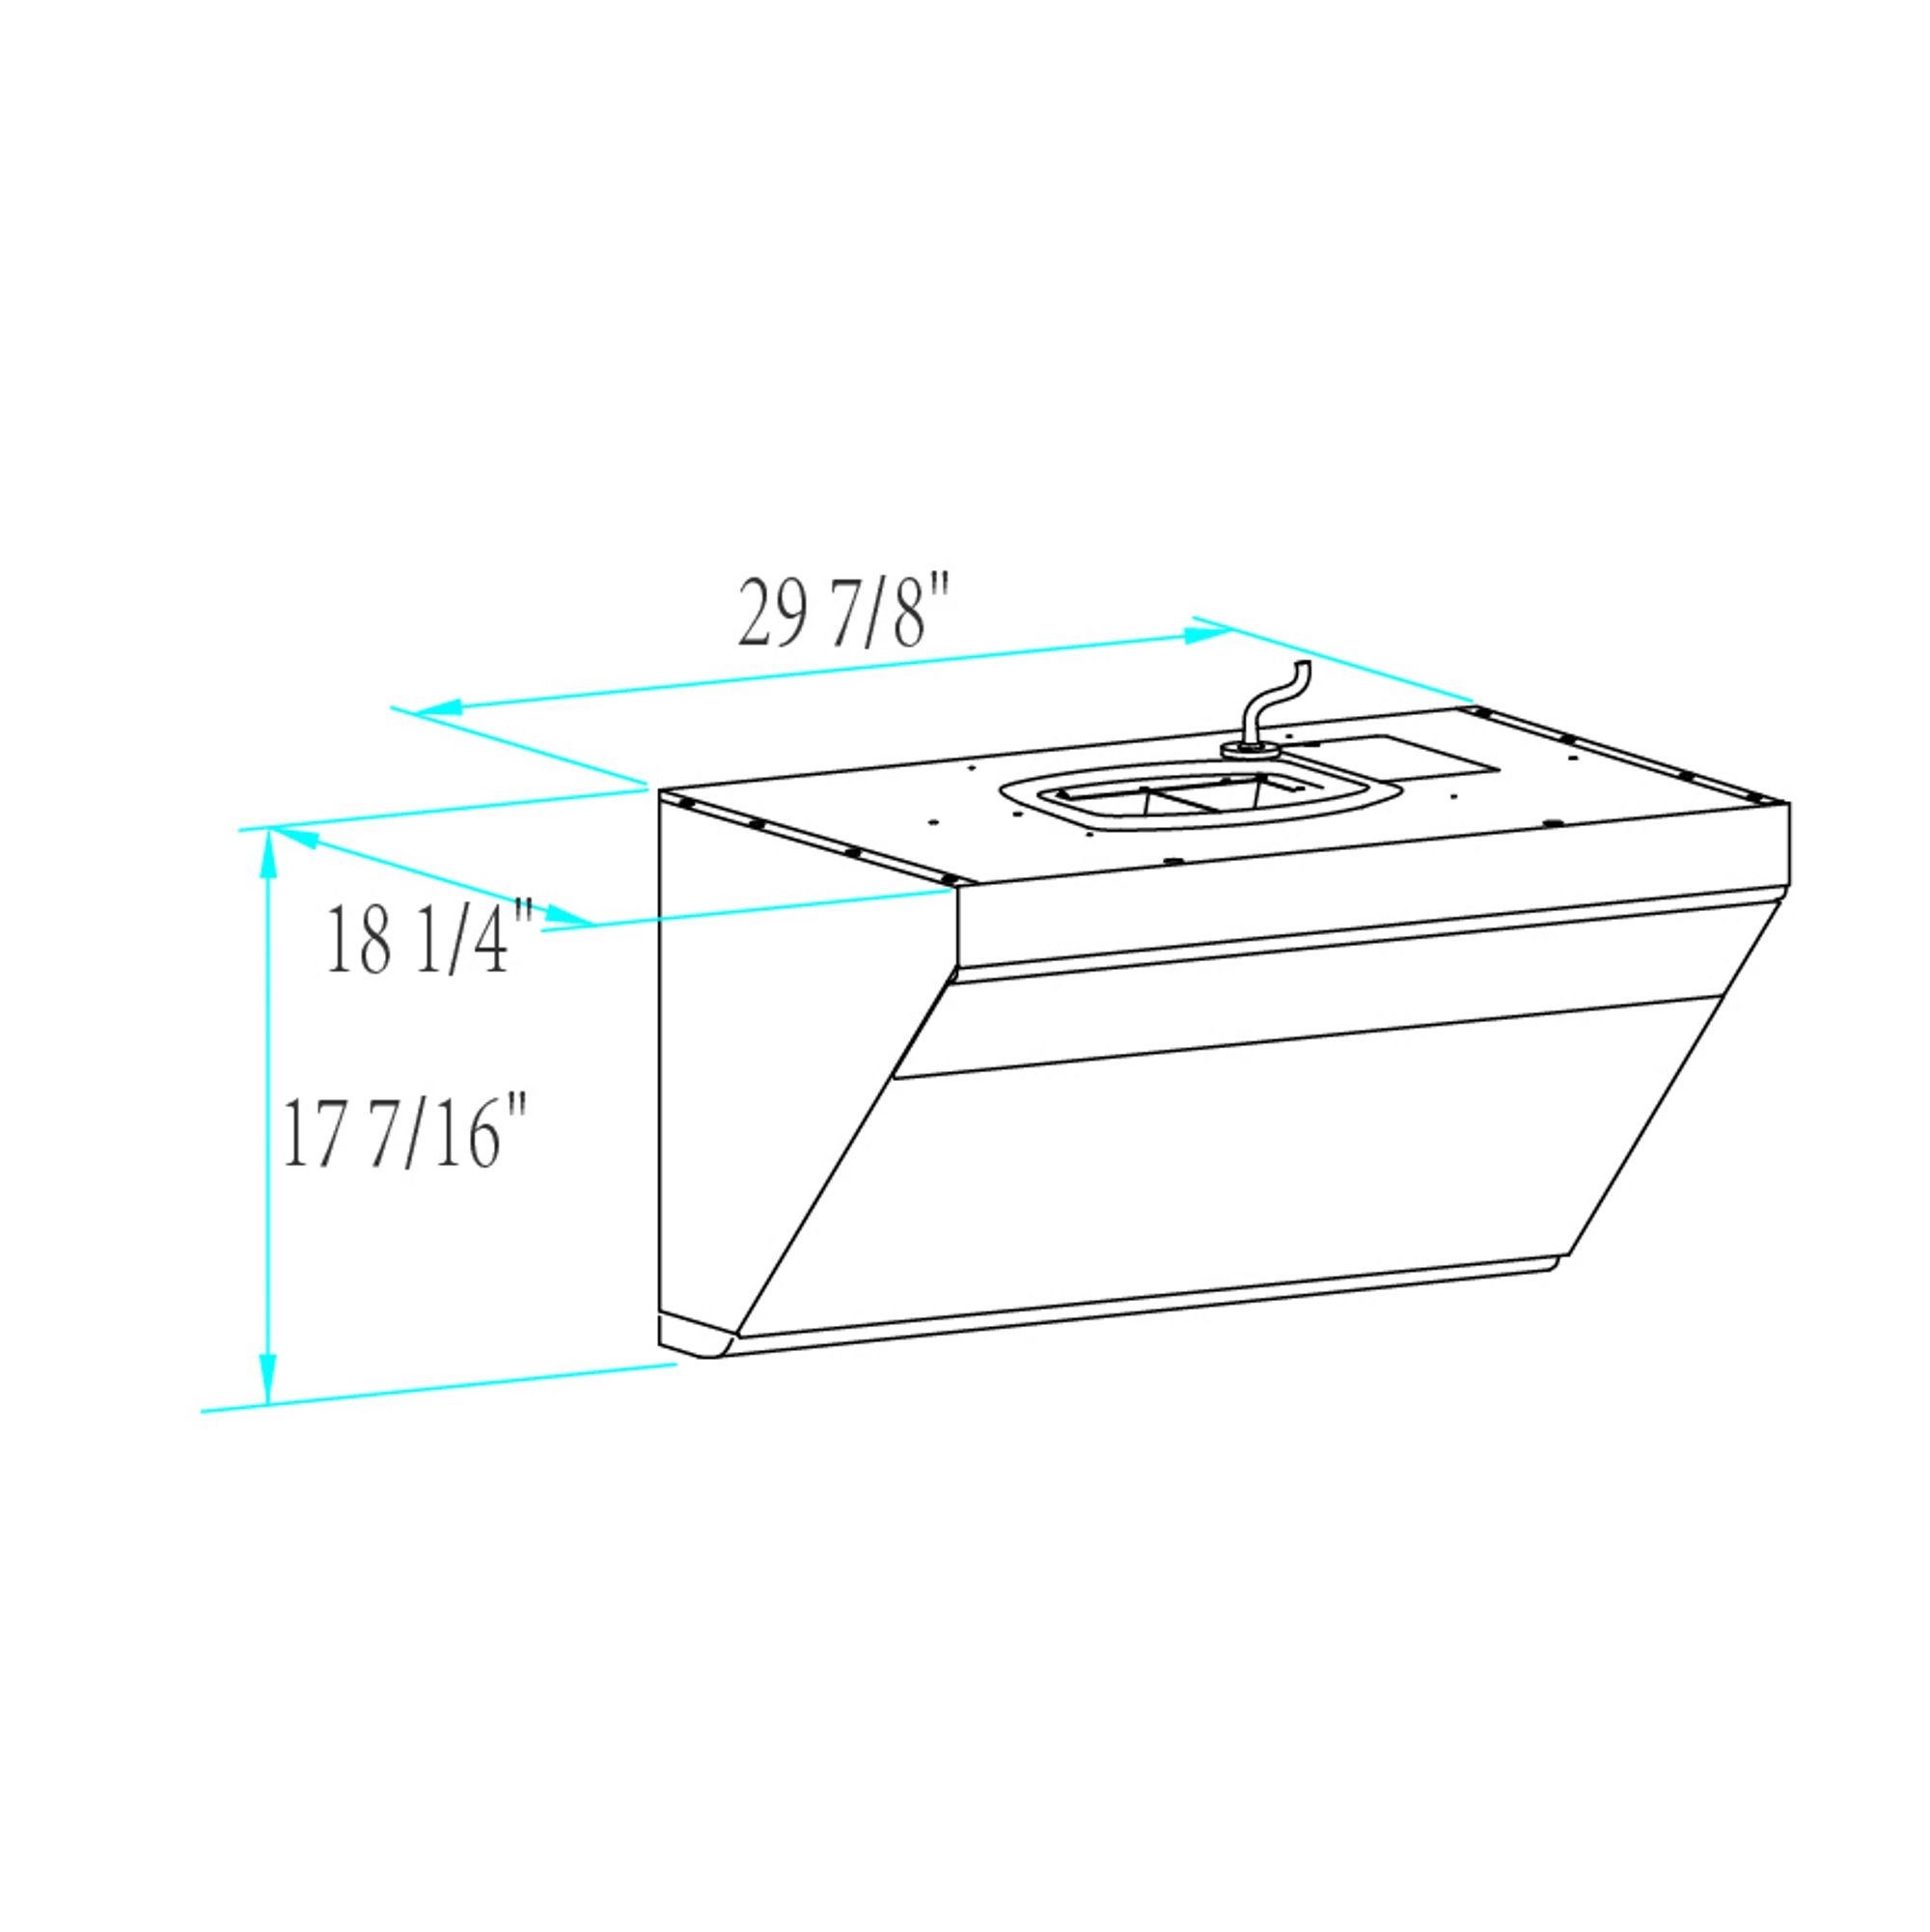 Jqg7501 G Dimension Best Range Hoods Installing Cabinets Range Hood